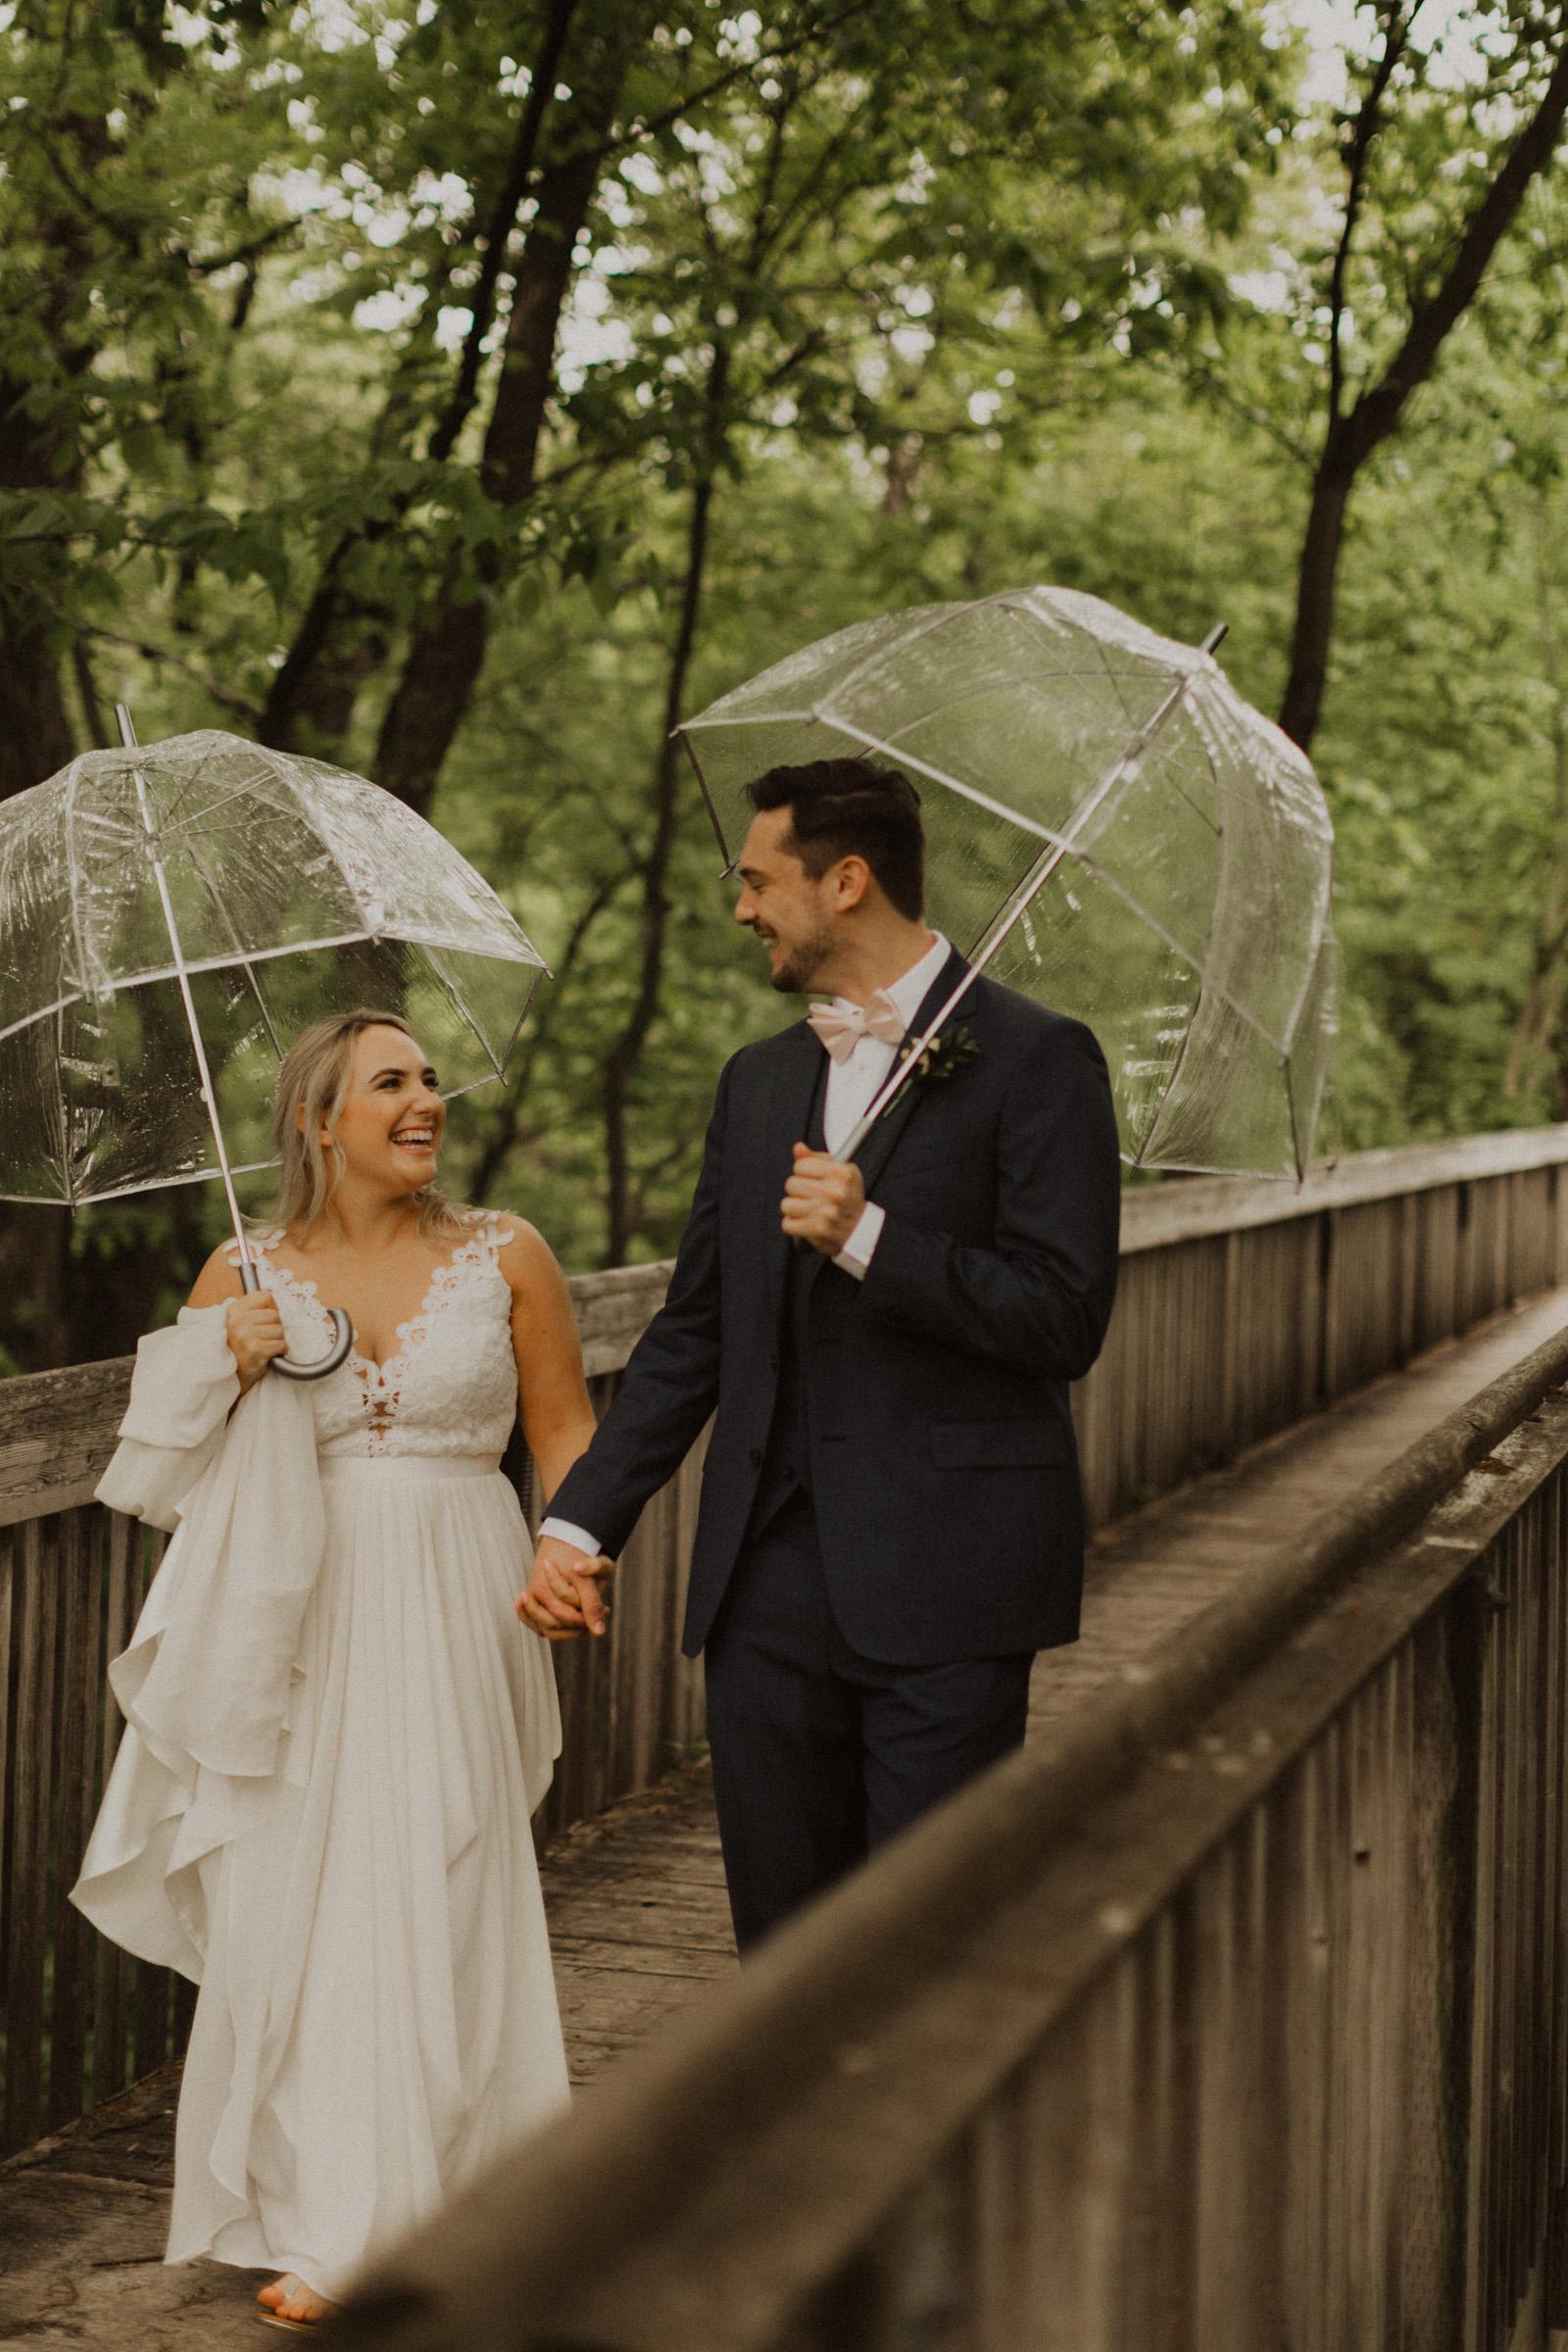 alyssa barletter photography nelson wedding nebraska city lied lodge morton barn spring wedding photographer-13.jpg